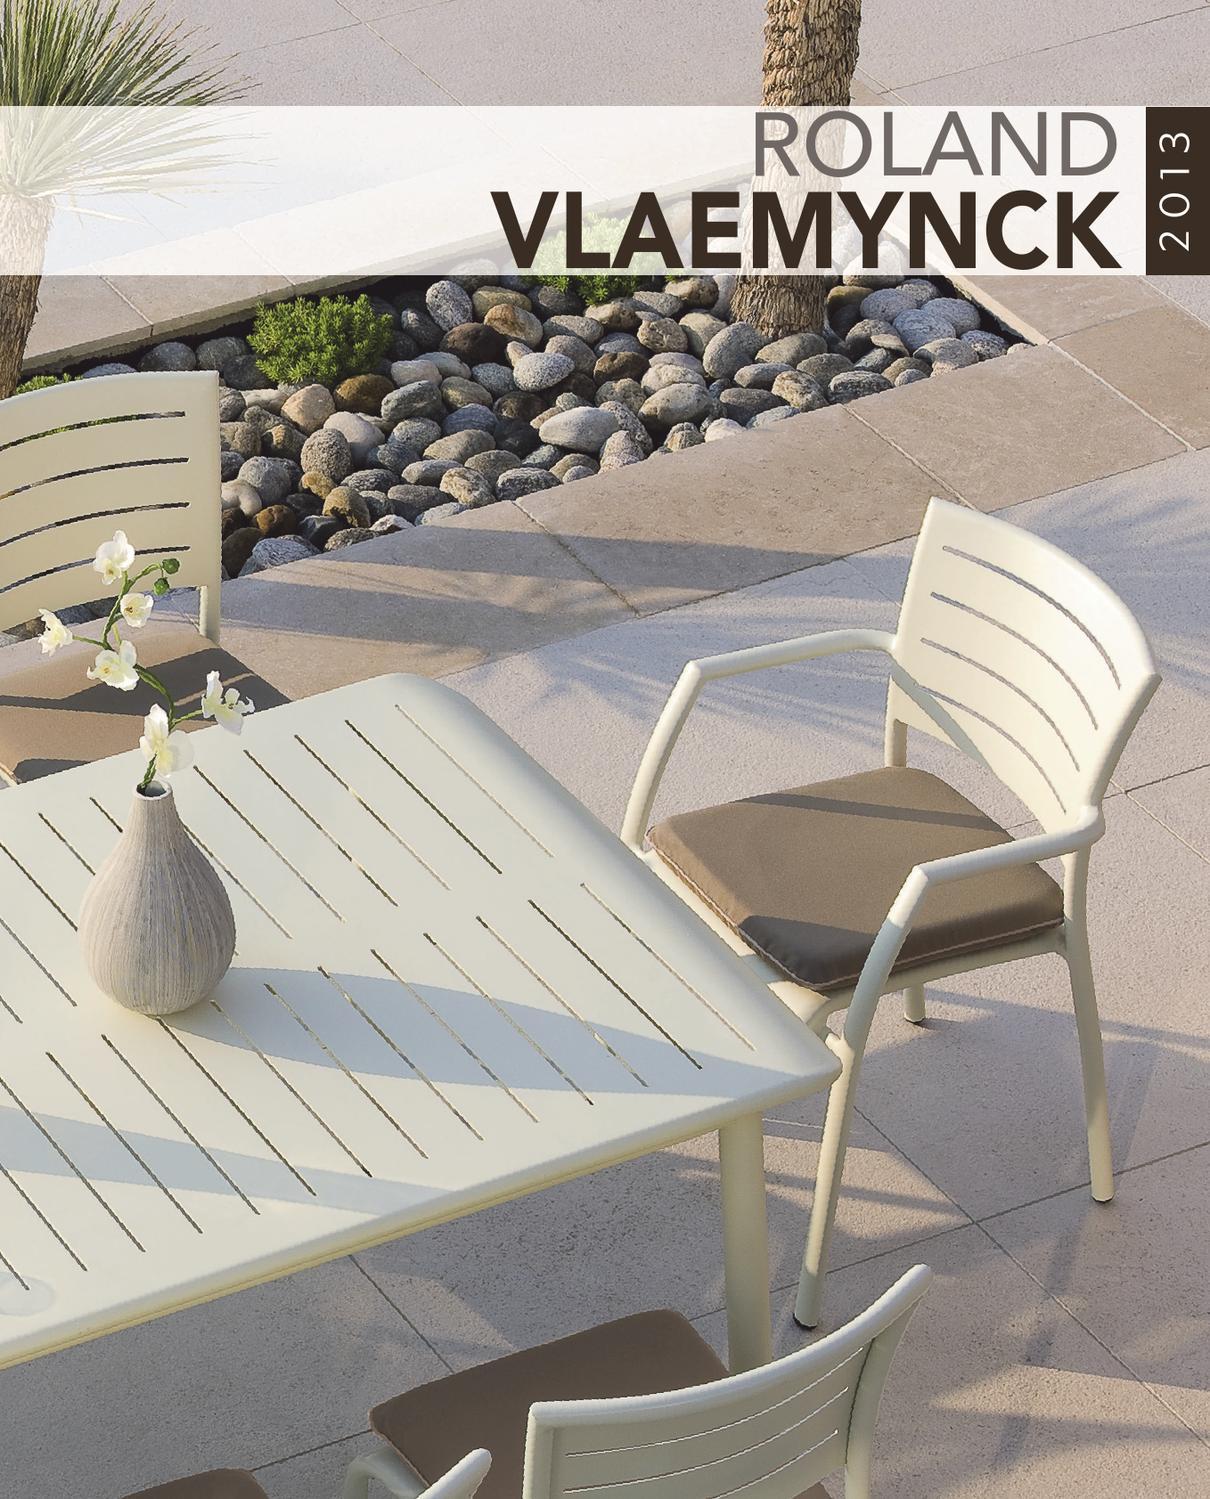 Mobilier De Jardin Alpes Maritimes catalogue particuliers mobilier outdoor roland vlaemynck